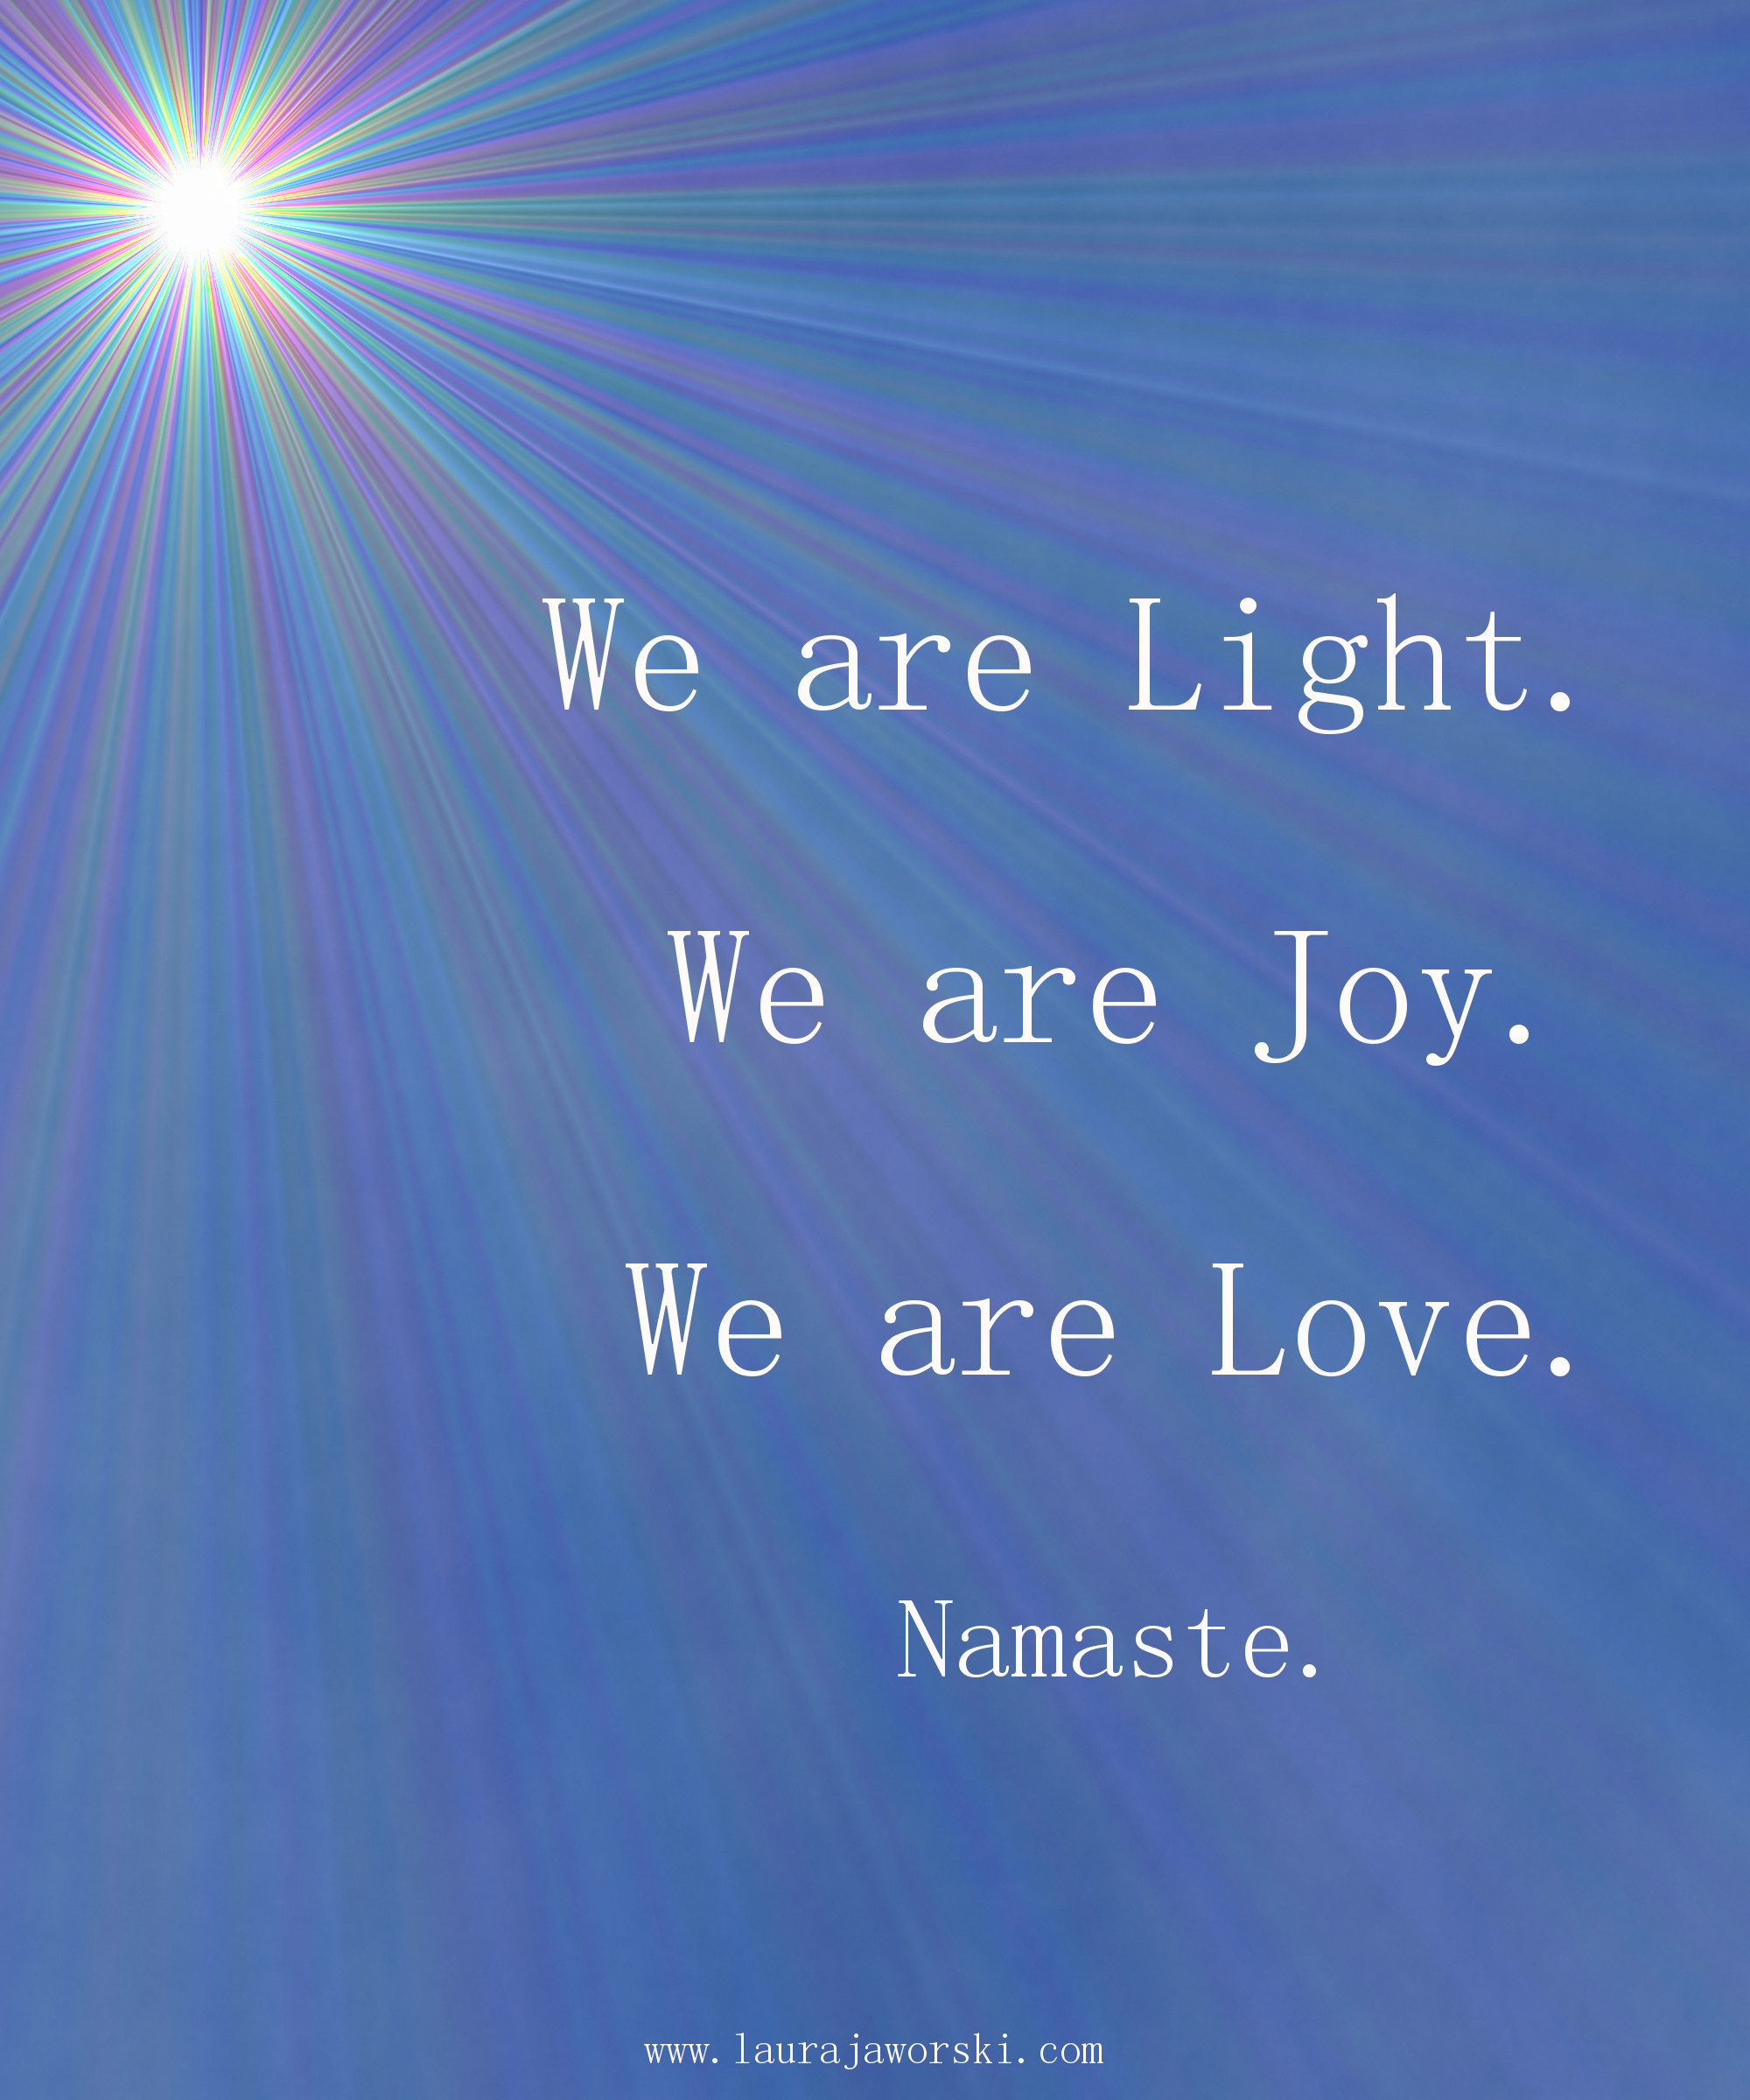 Light 💖 | www.laurajaworski.com